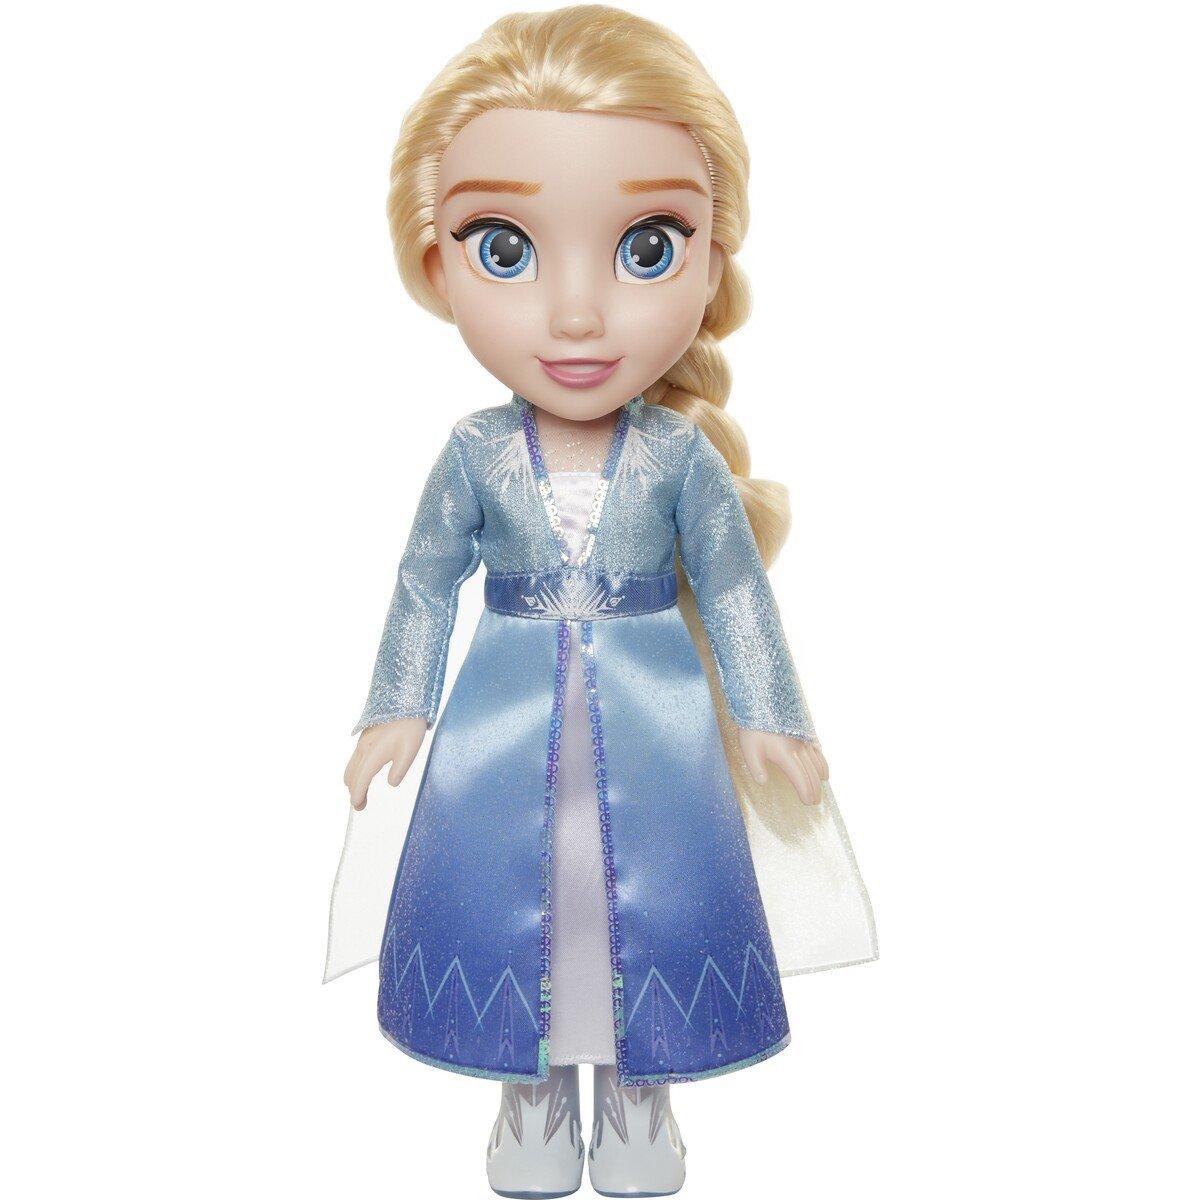 Frozen 2 - Elsa Singing Doll (206034)